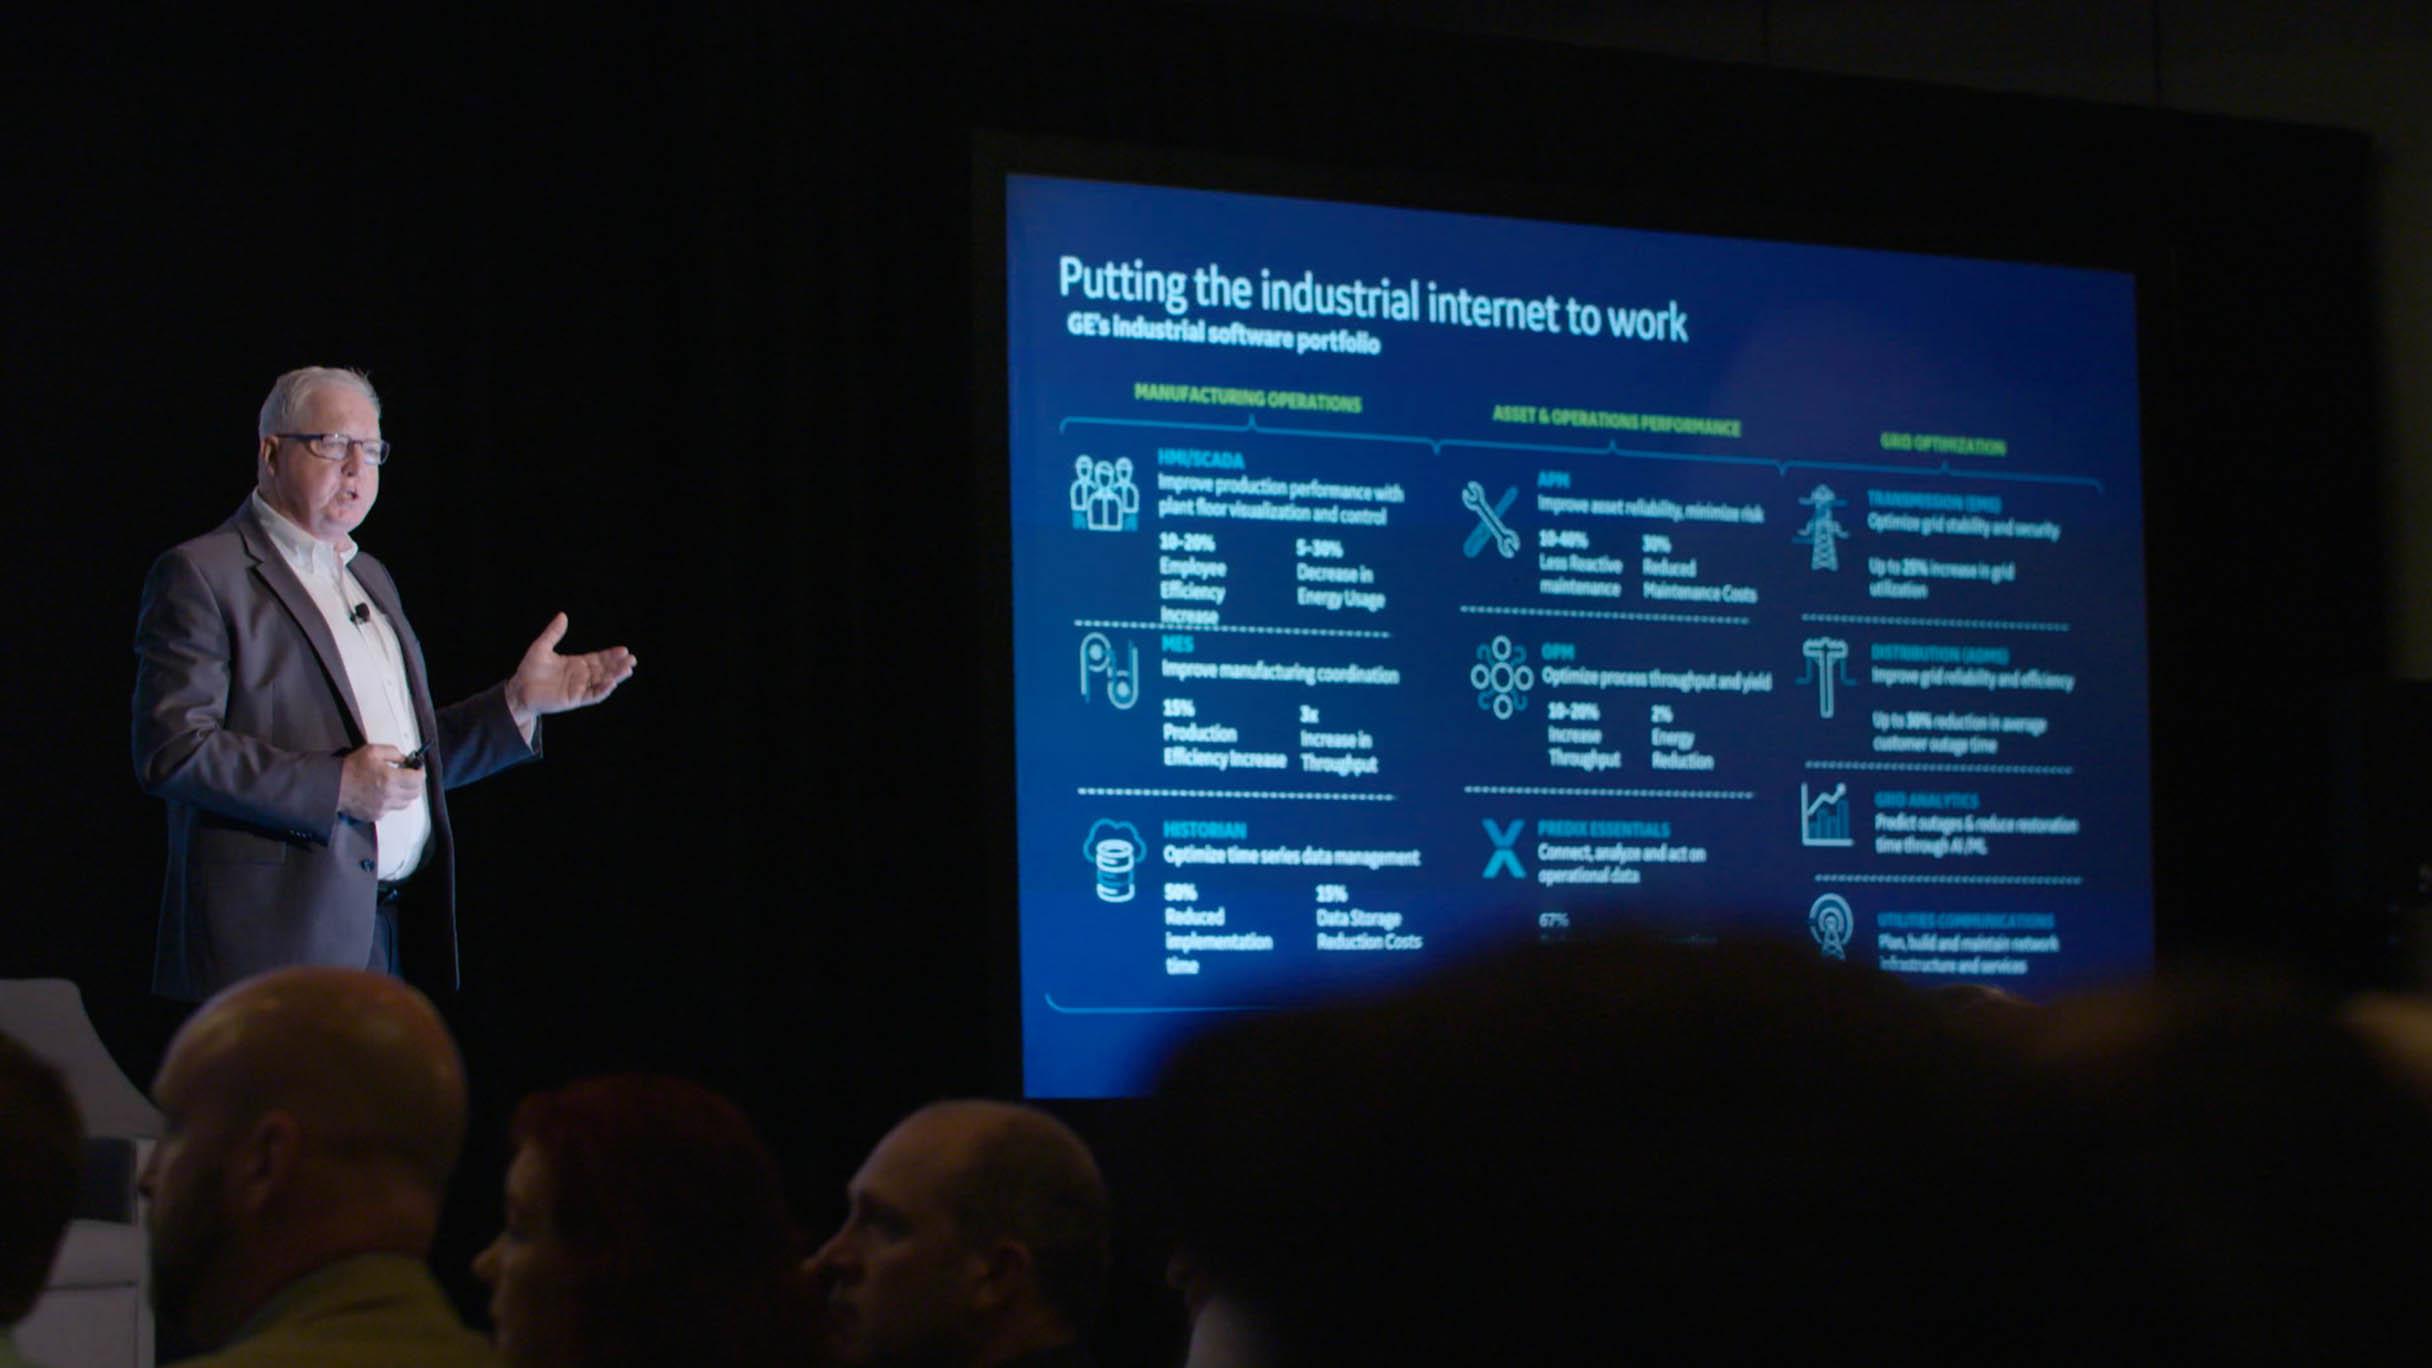 GE Digital CEO Pat Byrne on Digital Transformation